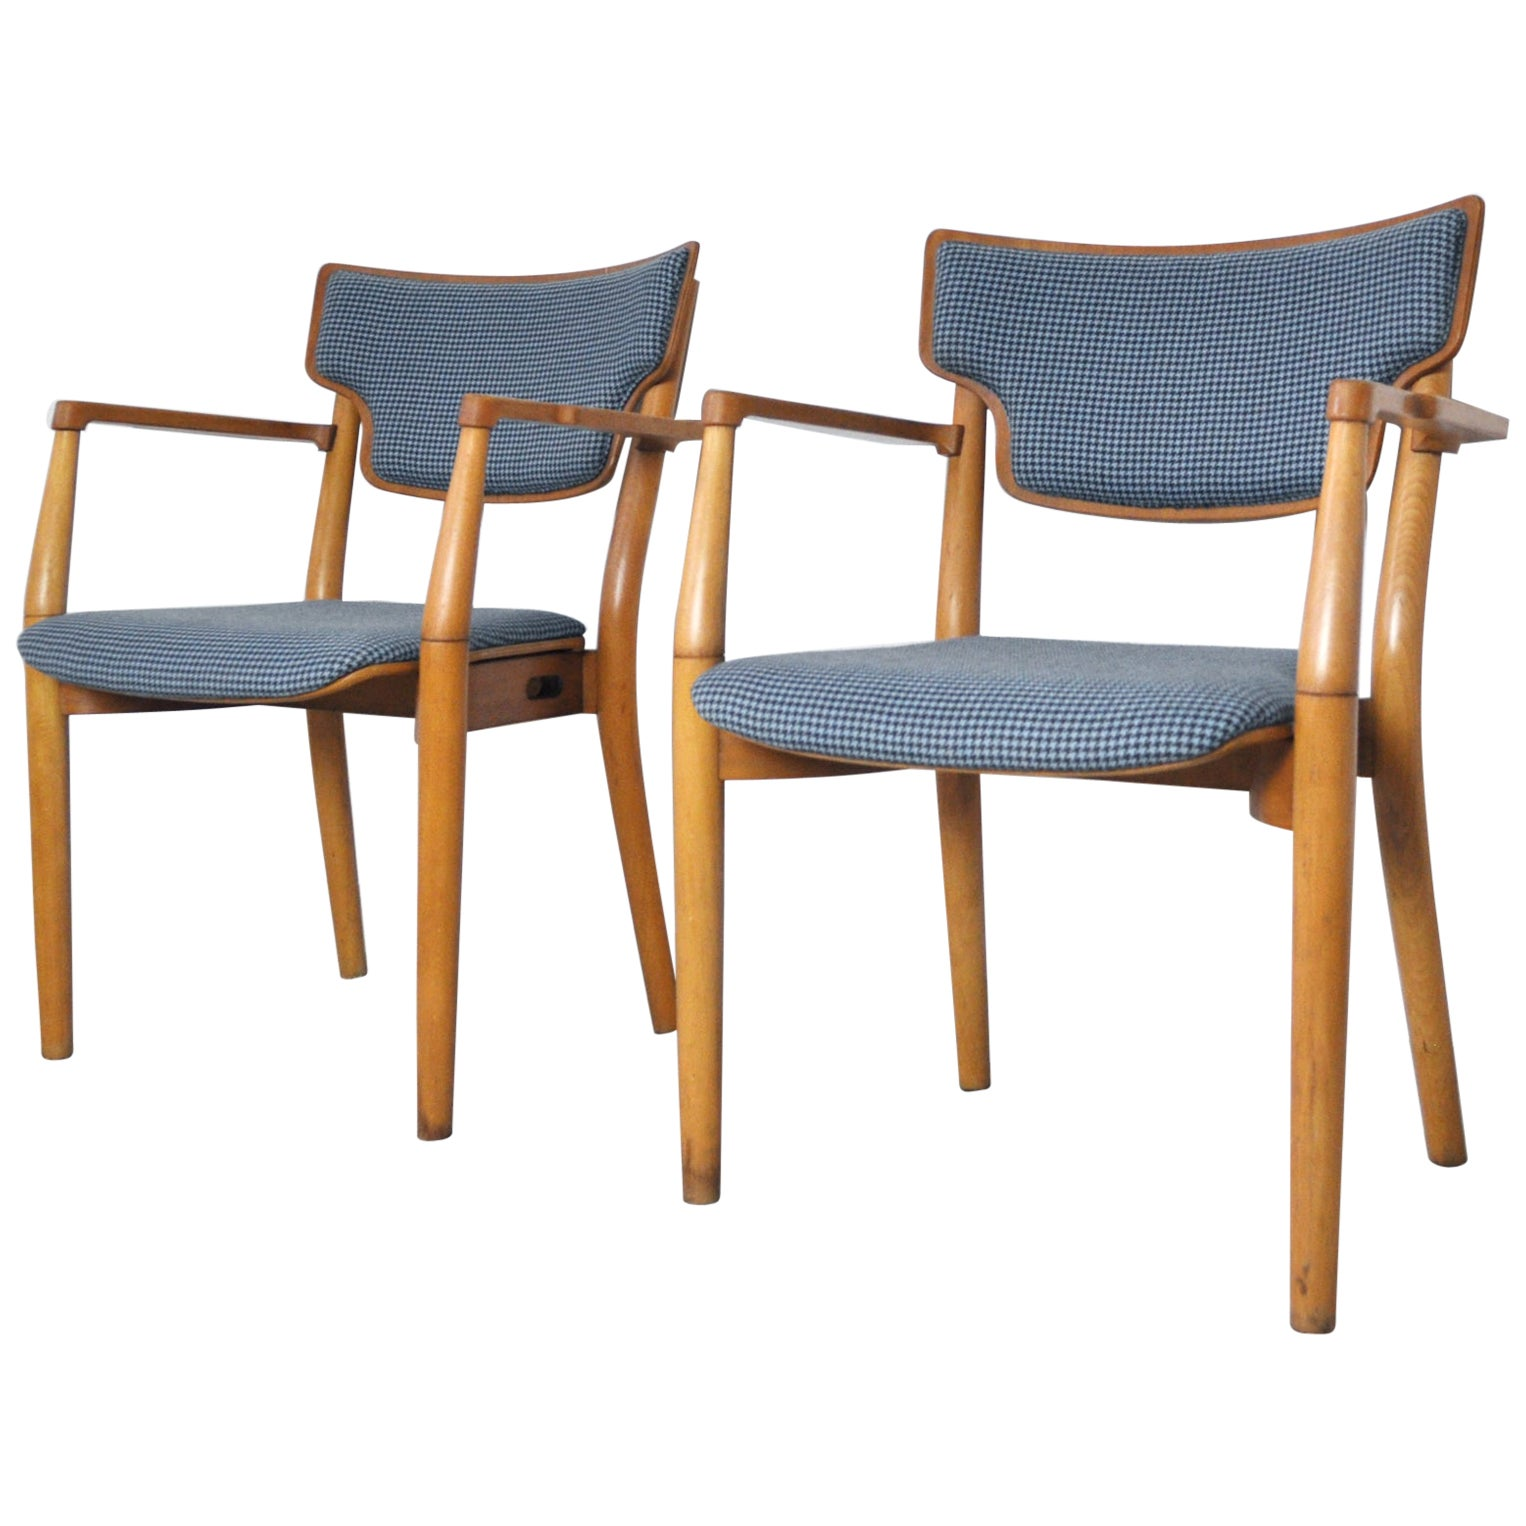 Portex Armchairs Designed by Peter Hvidt & Orla Mølgaard-Nielsen